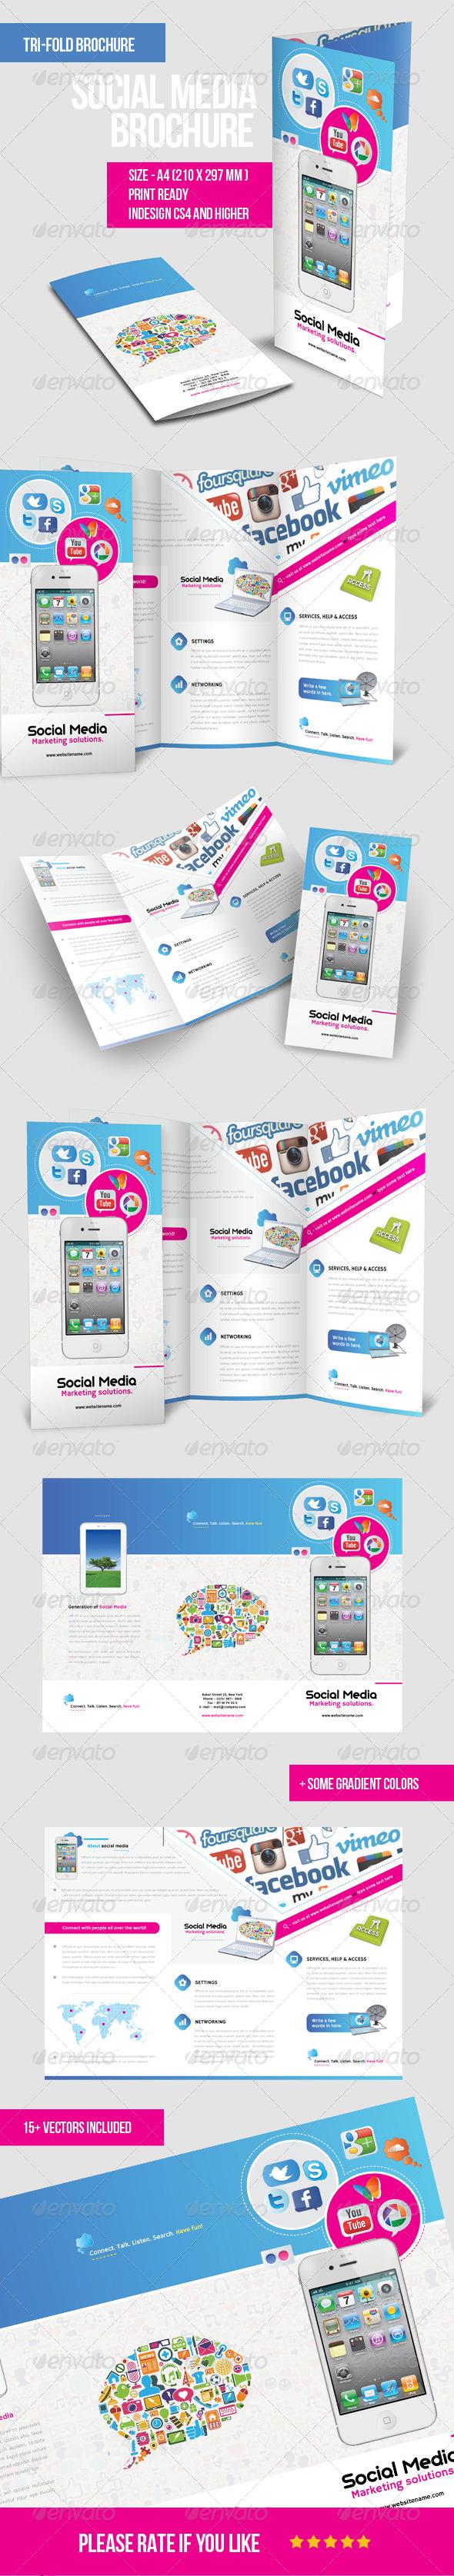 Mobile & Social Media Tri - fold Brochure - Brochures Print Templates